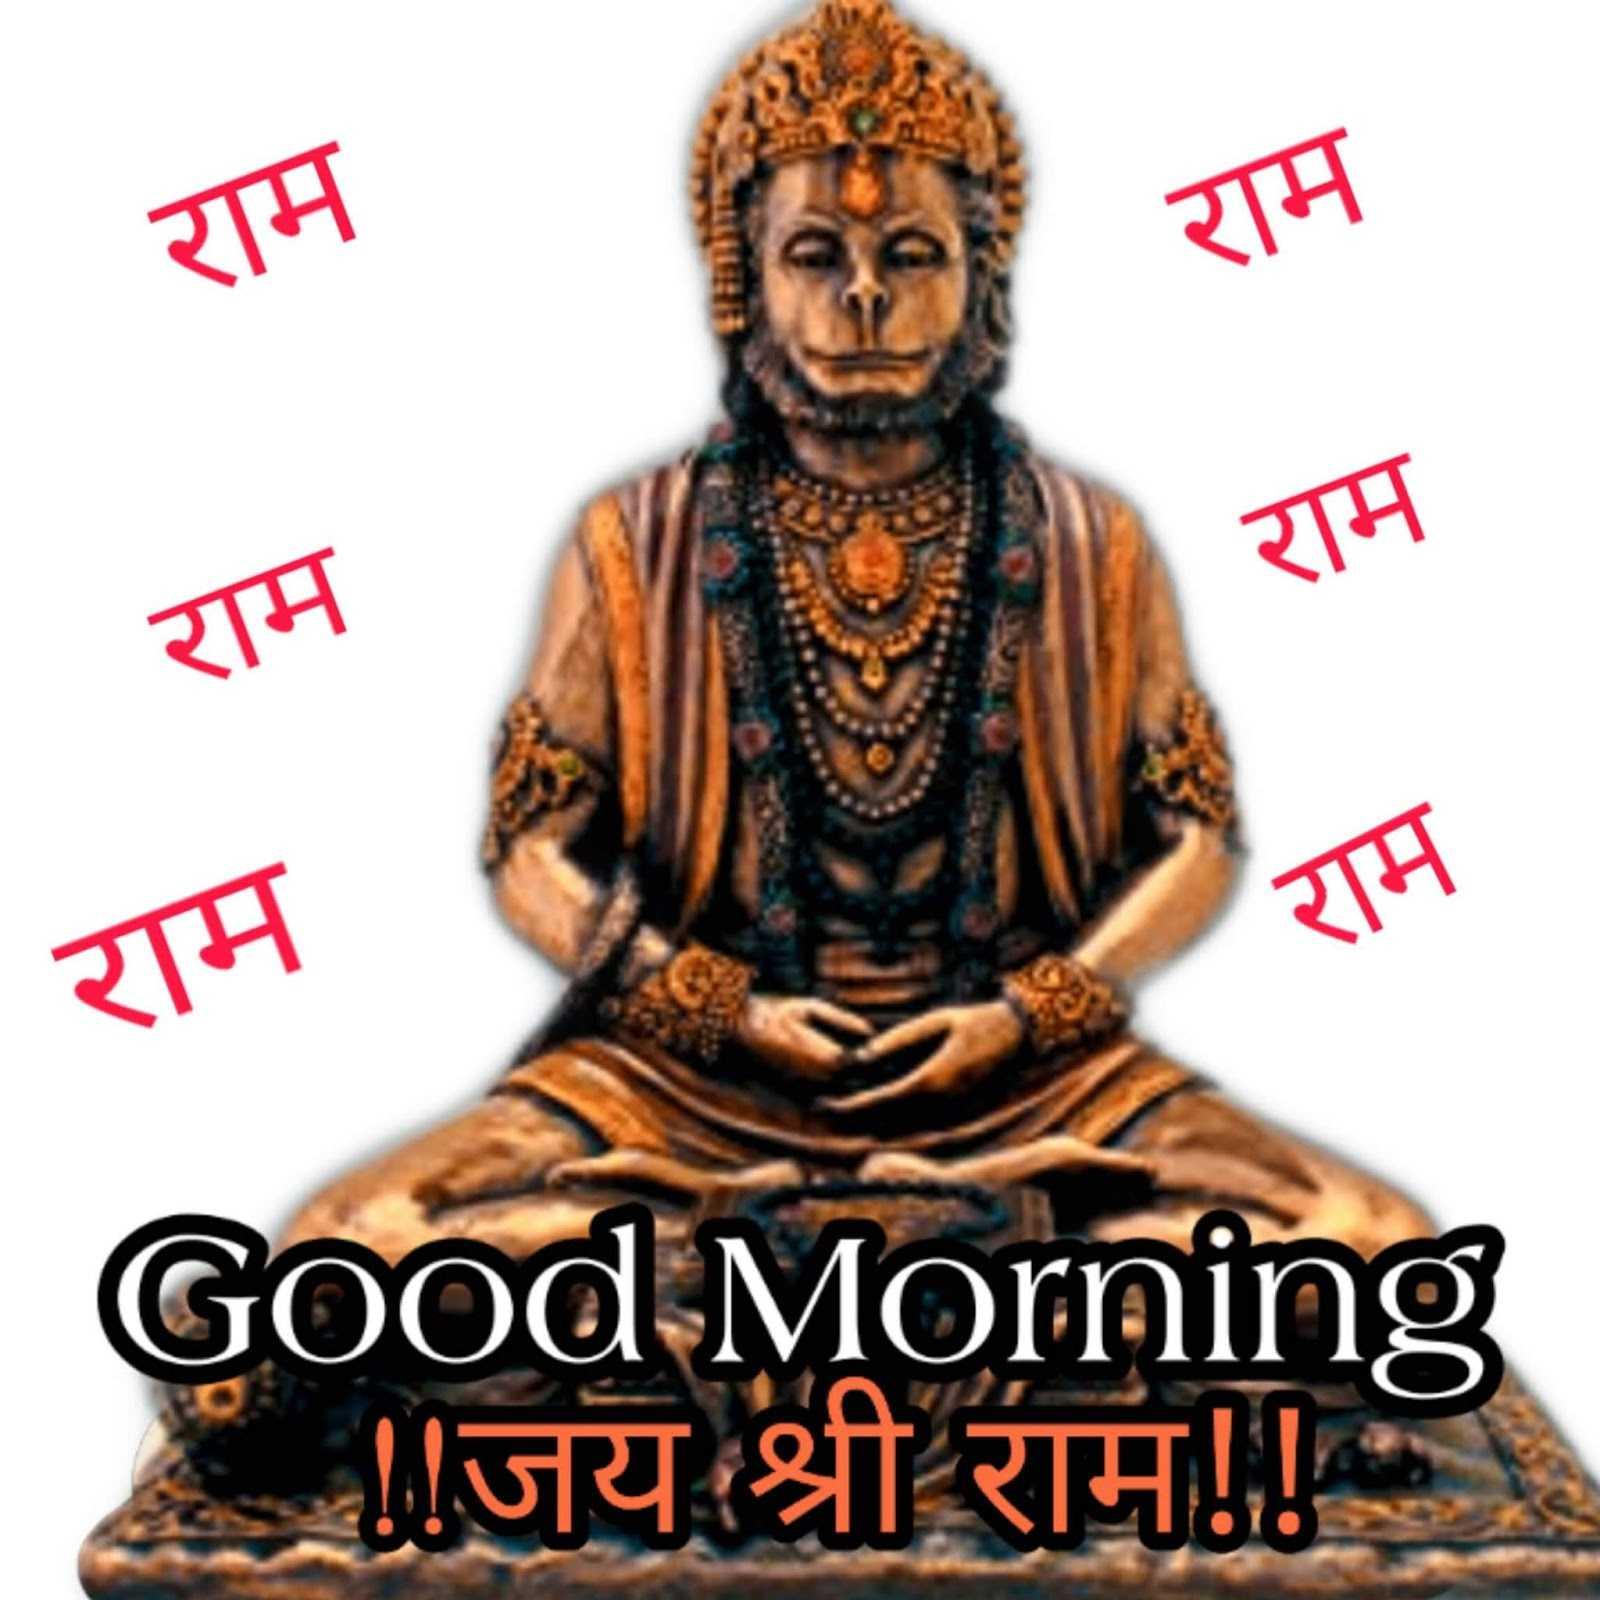 God Anjaneya Good Morning Images - God Anjaneya Good Morning Images